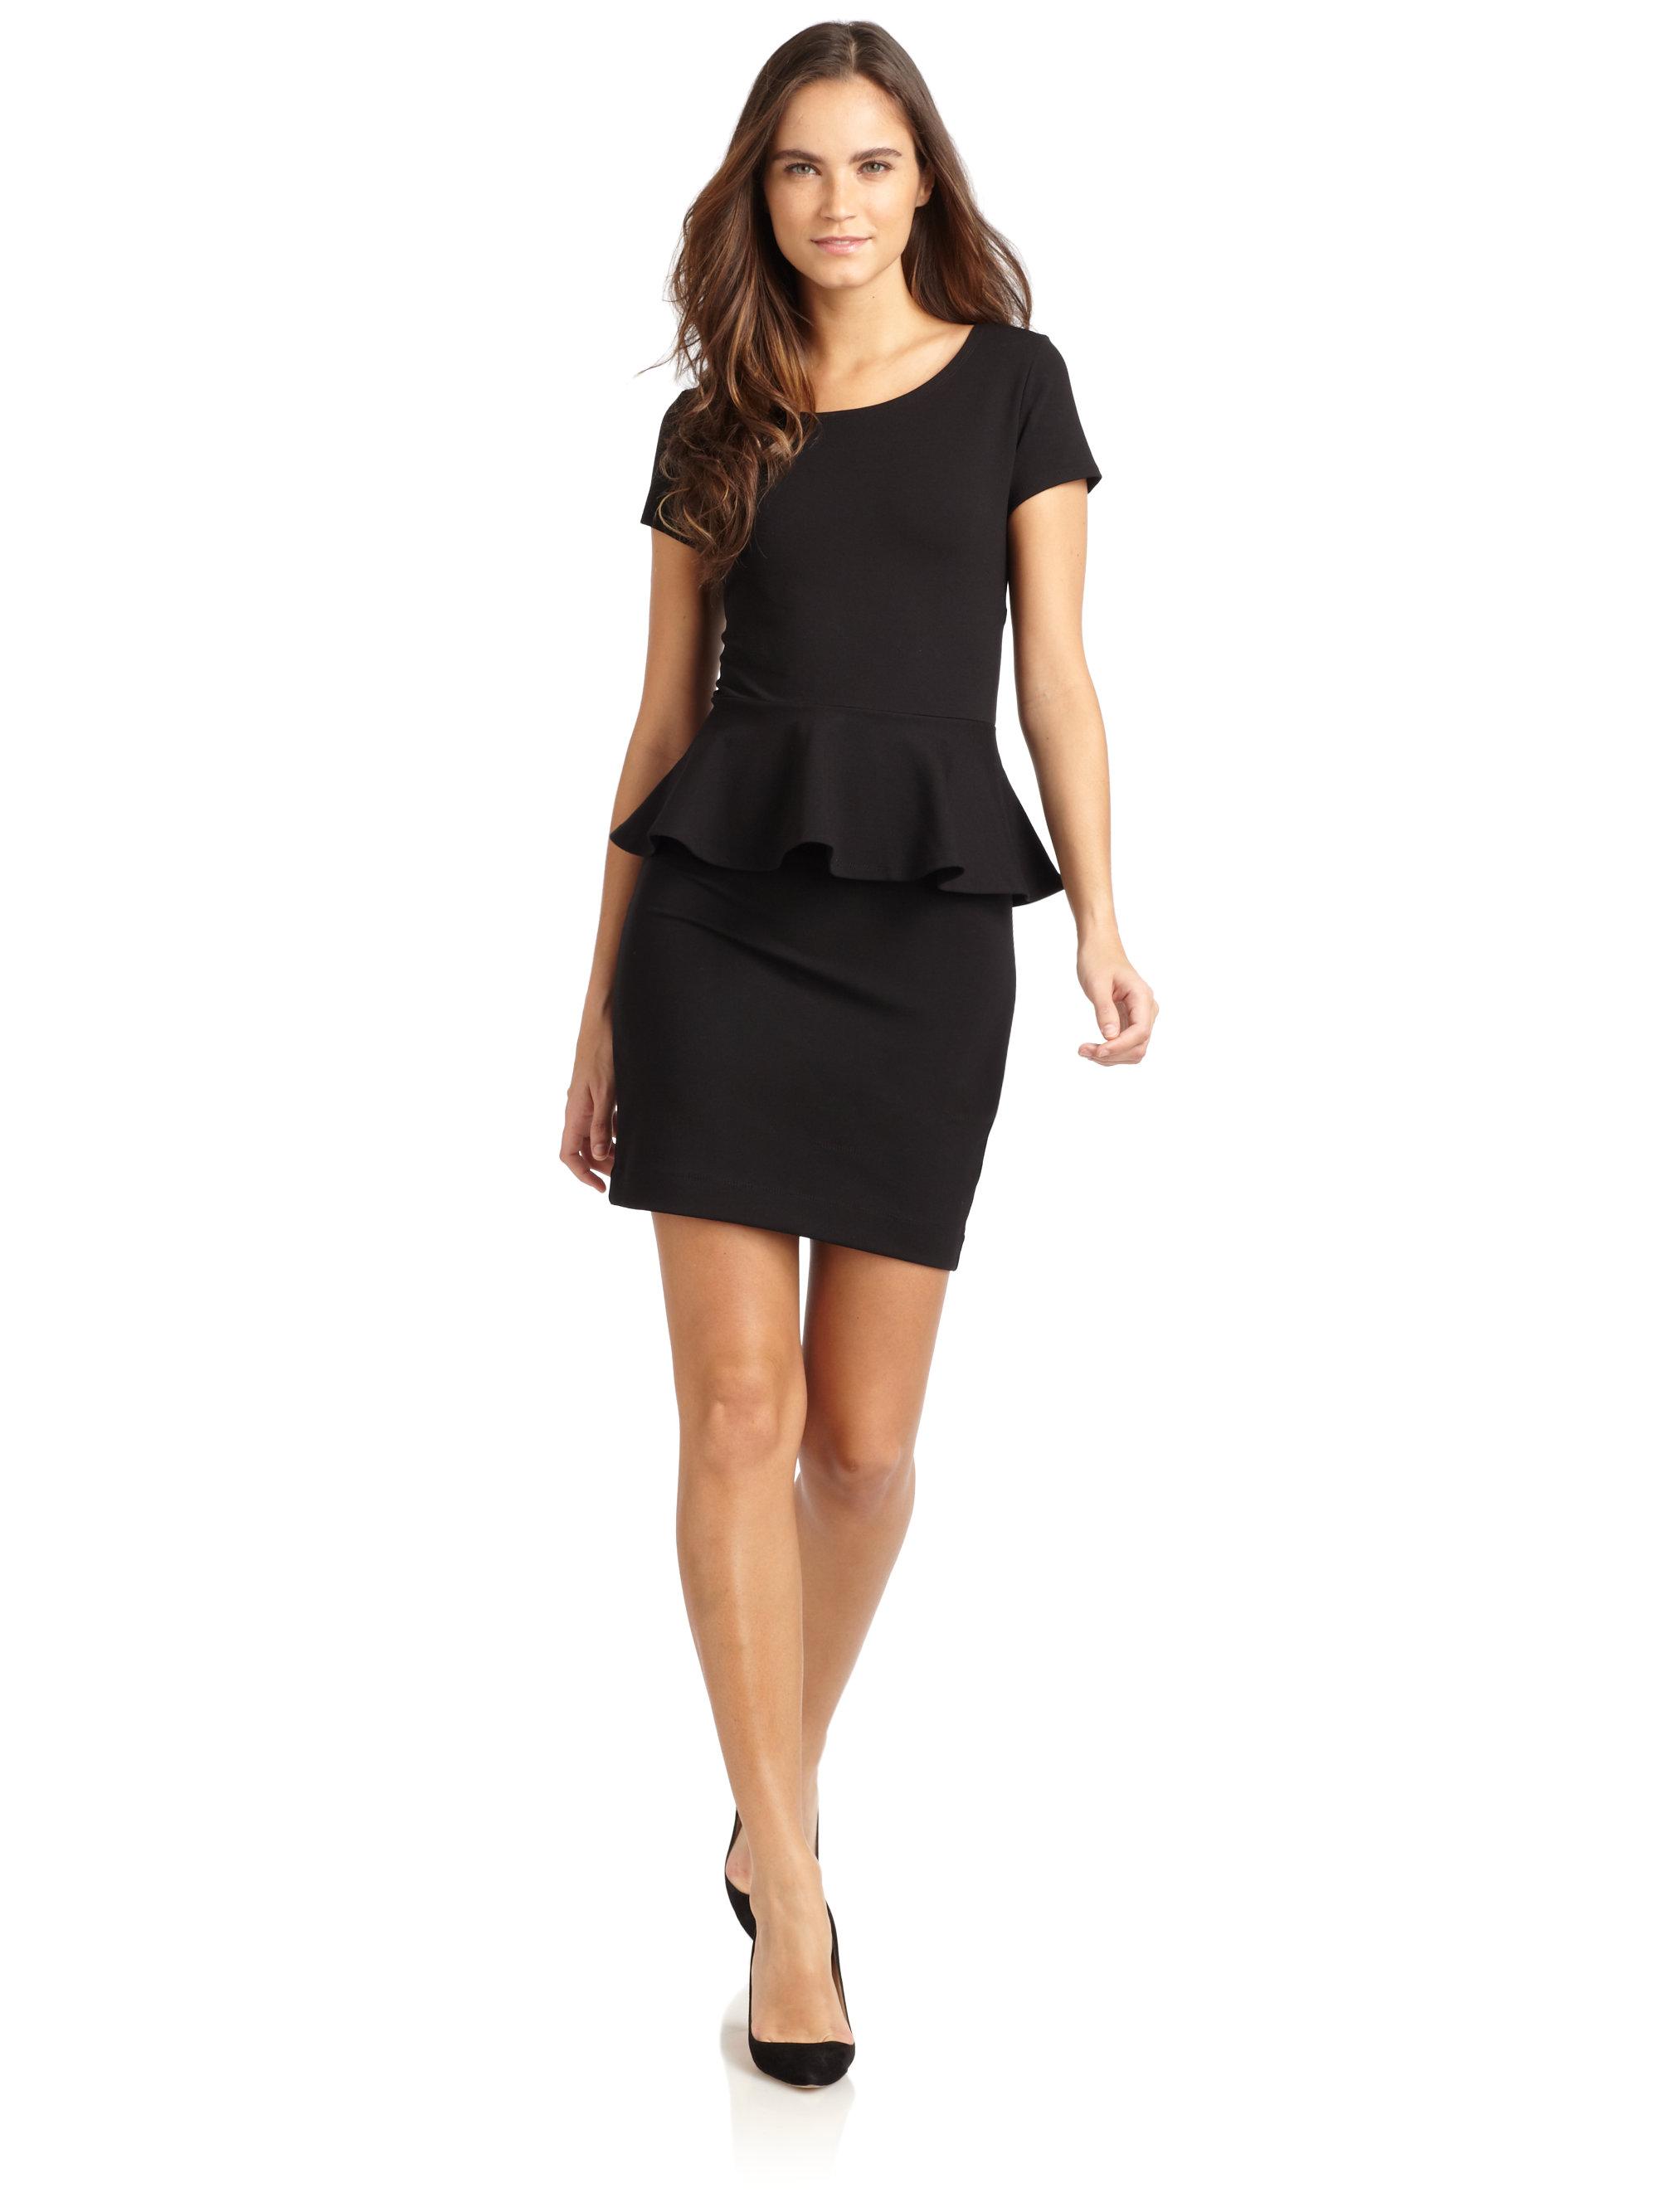 Lyst - Saks Fifth Avenue Pont233 Peplum Dress in Black